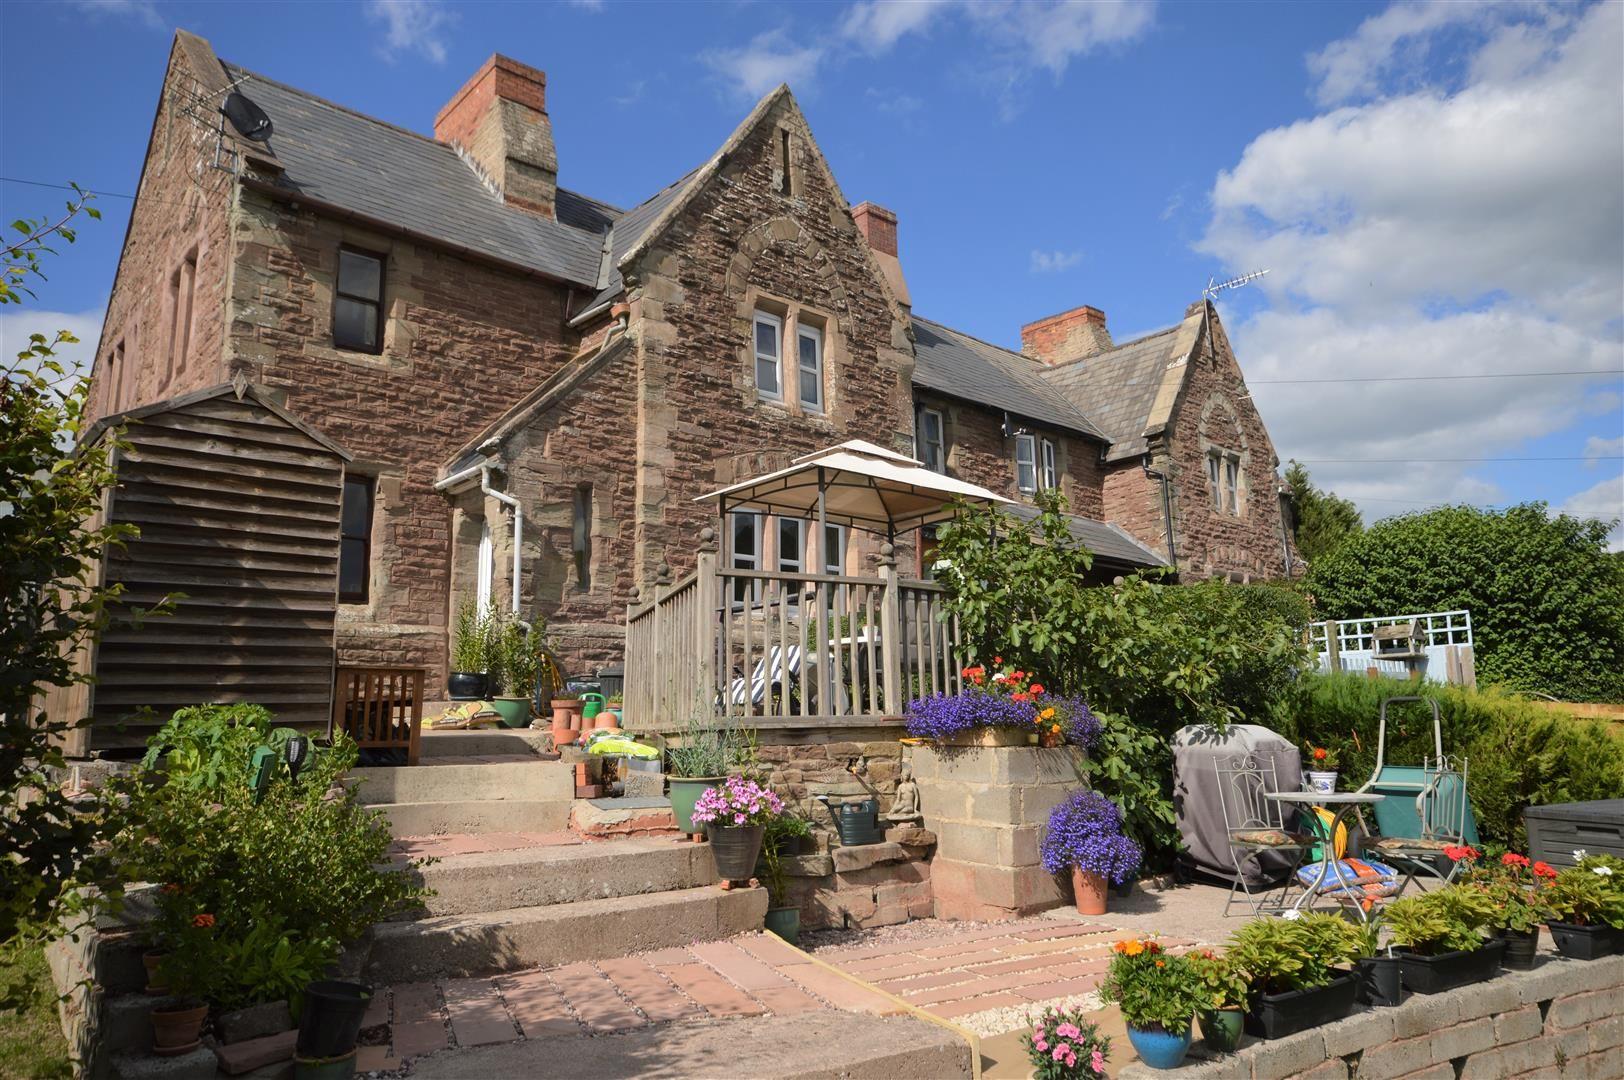 2 bed cottage for sale in Hope-Under-Dinmore, HR6